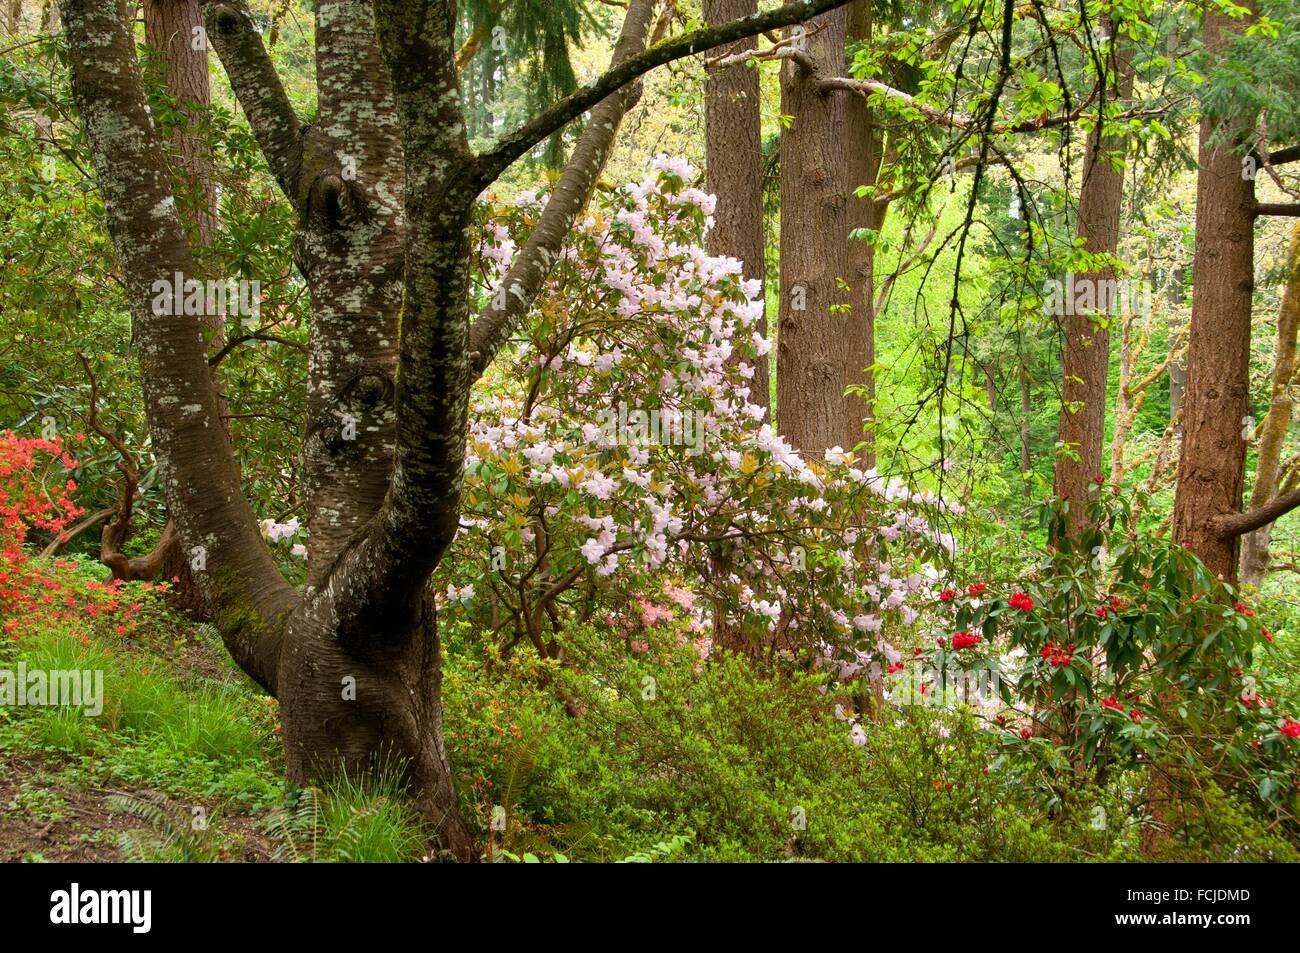 Rhododendron in bloom in forest, The Rhododendron Garden, Hendricks ...